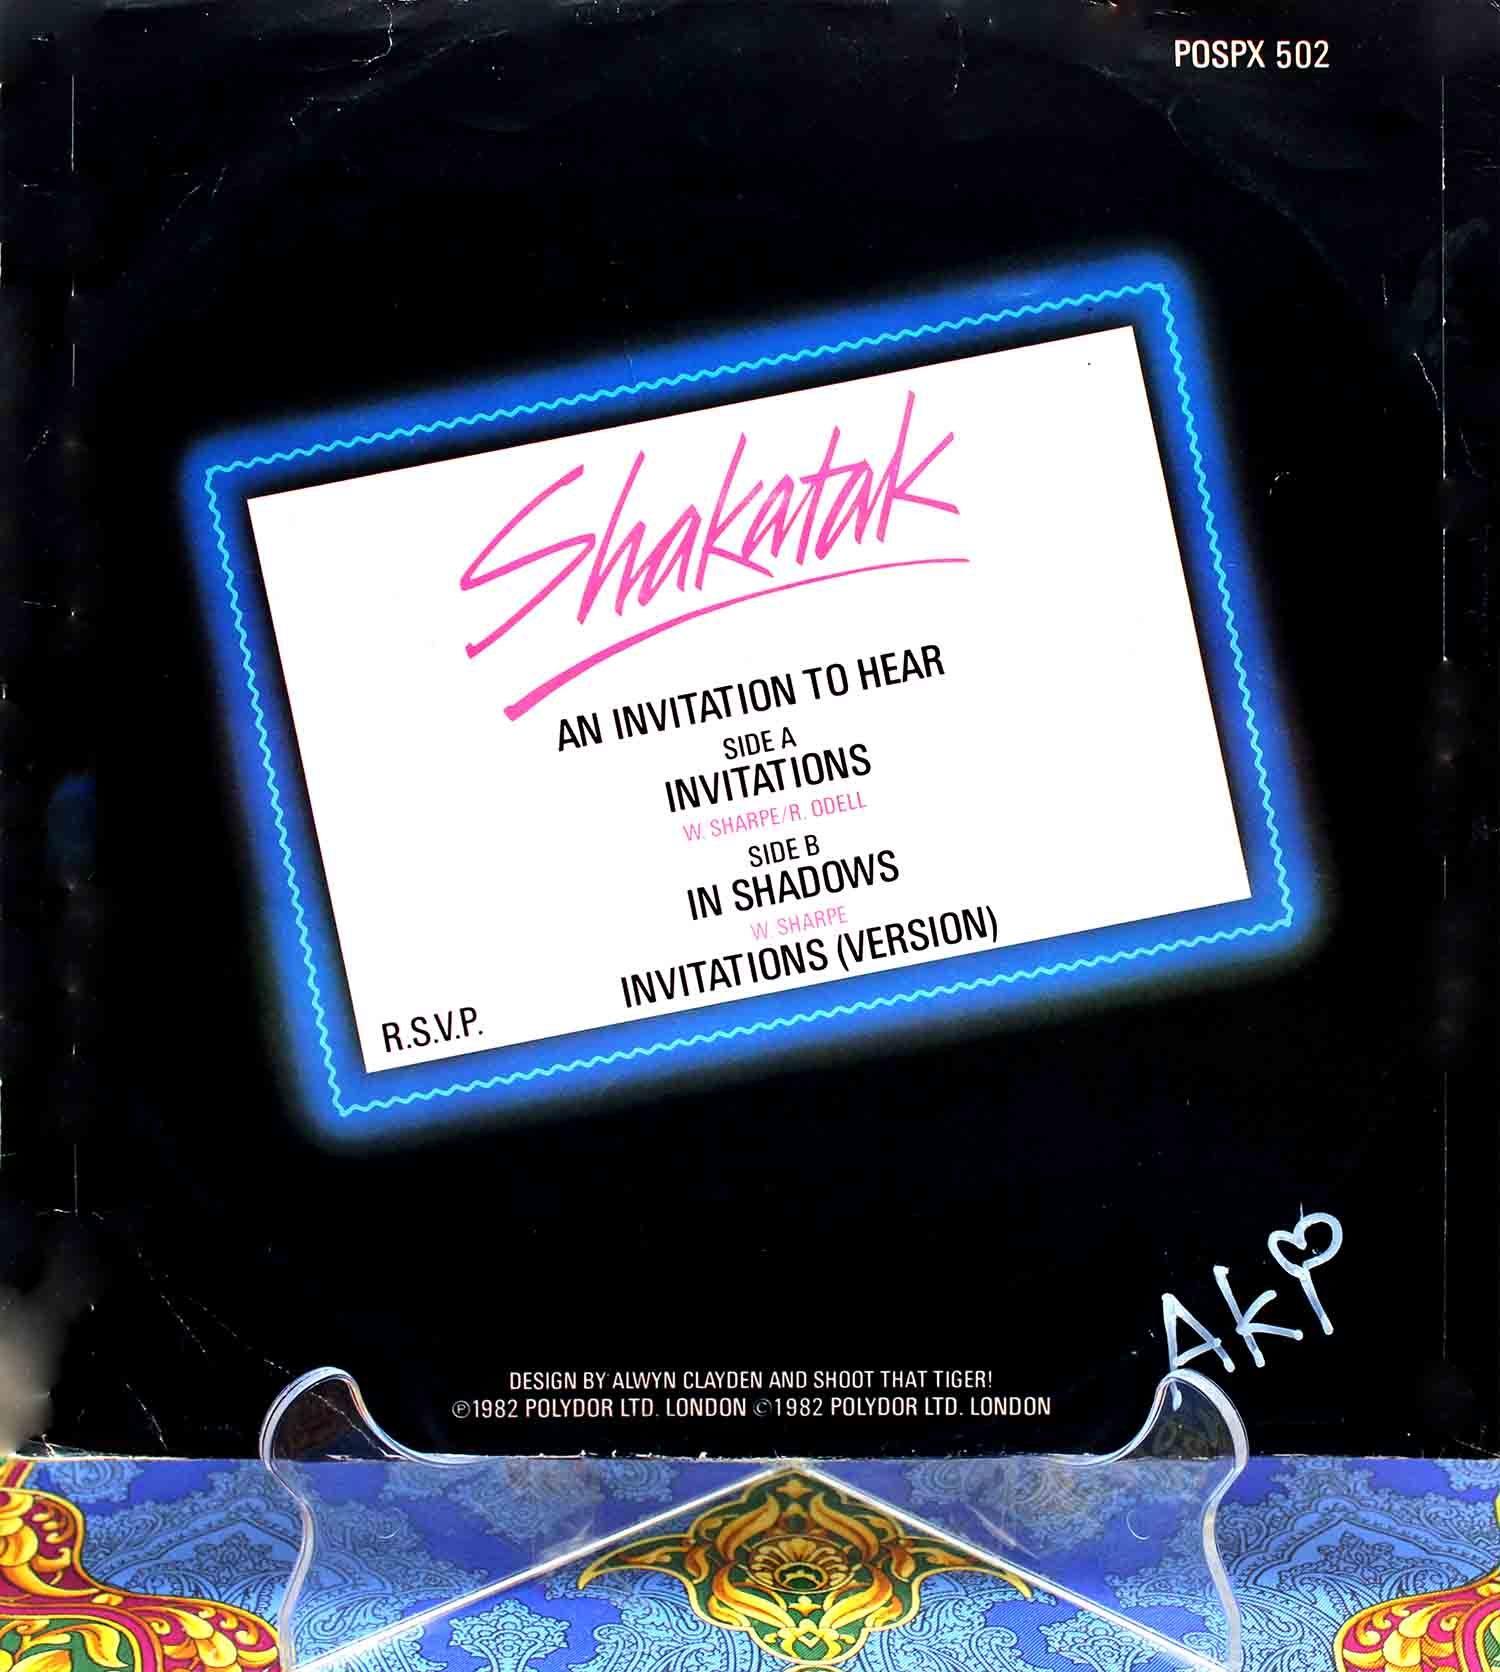 Shakatak – Invitations 02